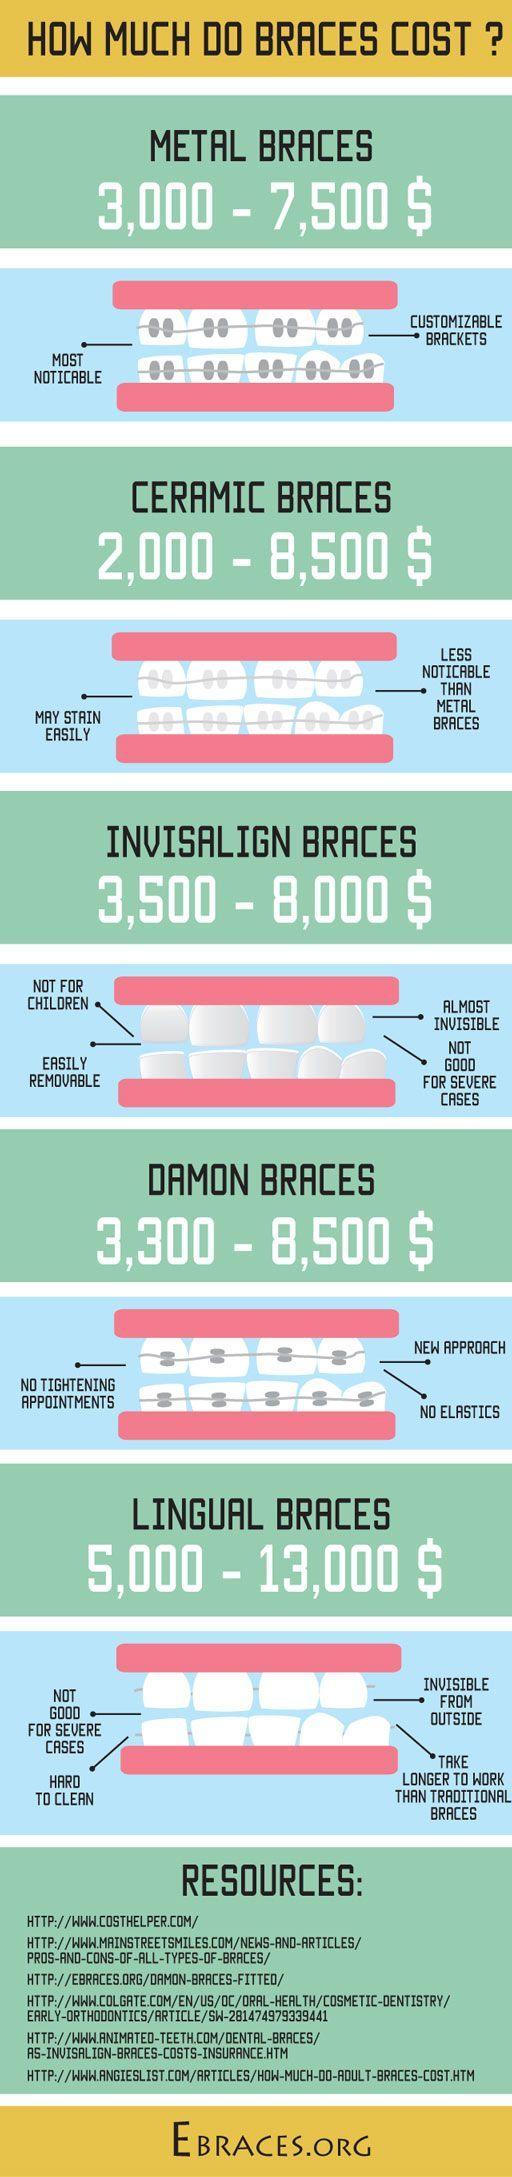 braces cost infographic